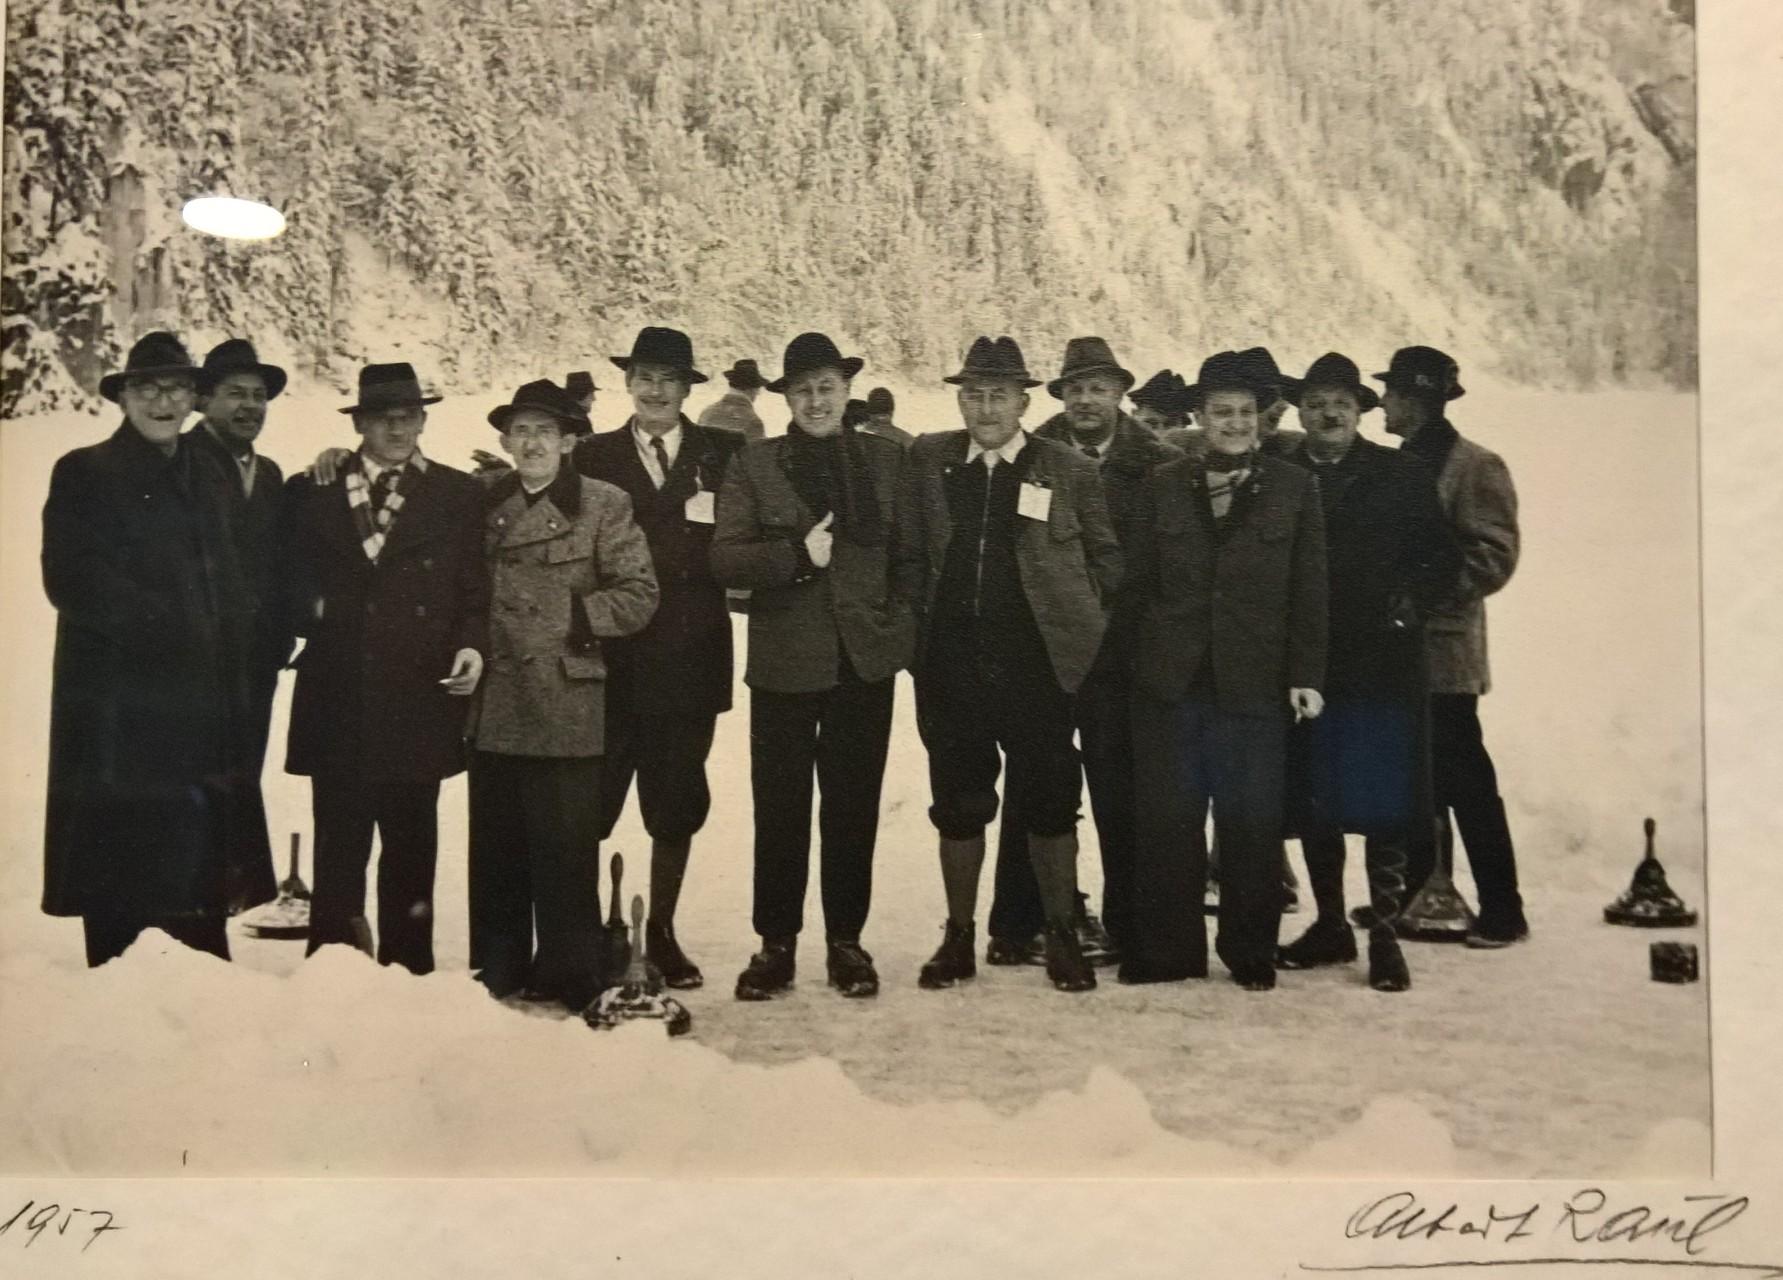 1957 - Tpolitzsee Stockschützen des ESV Altmünster